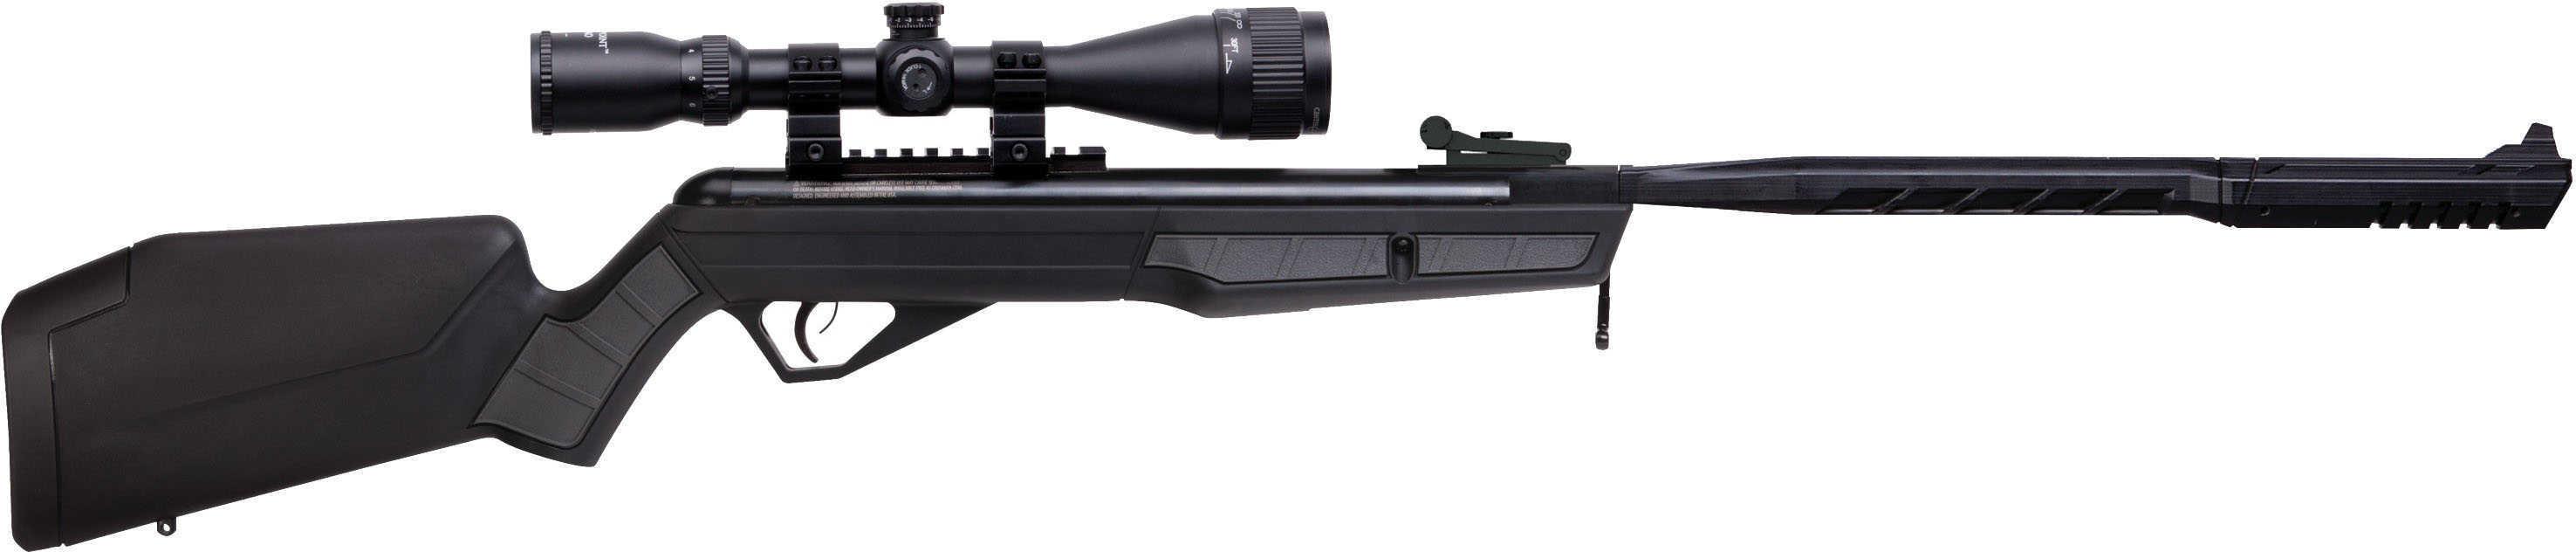 Benjamin BVH17TPSSSX Vaporizer Air Rifle Nitrogen Piston 177 Pellet Black Black Fixed Stock 3-9X40mm Scope